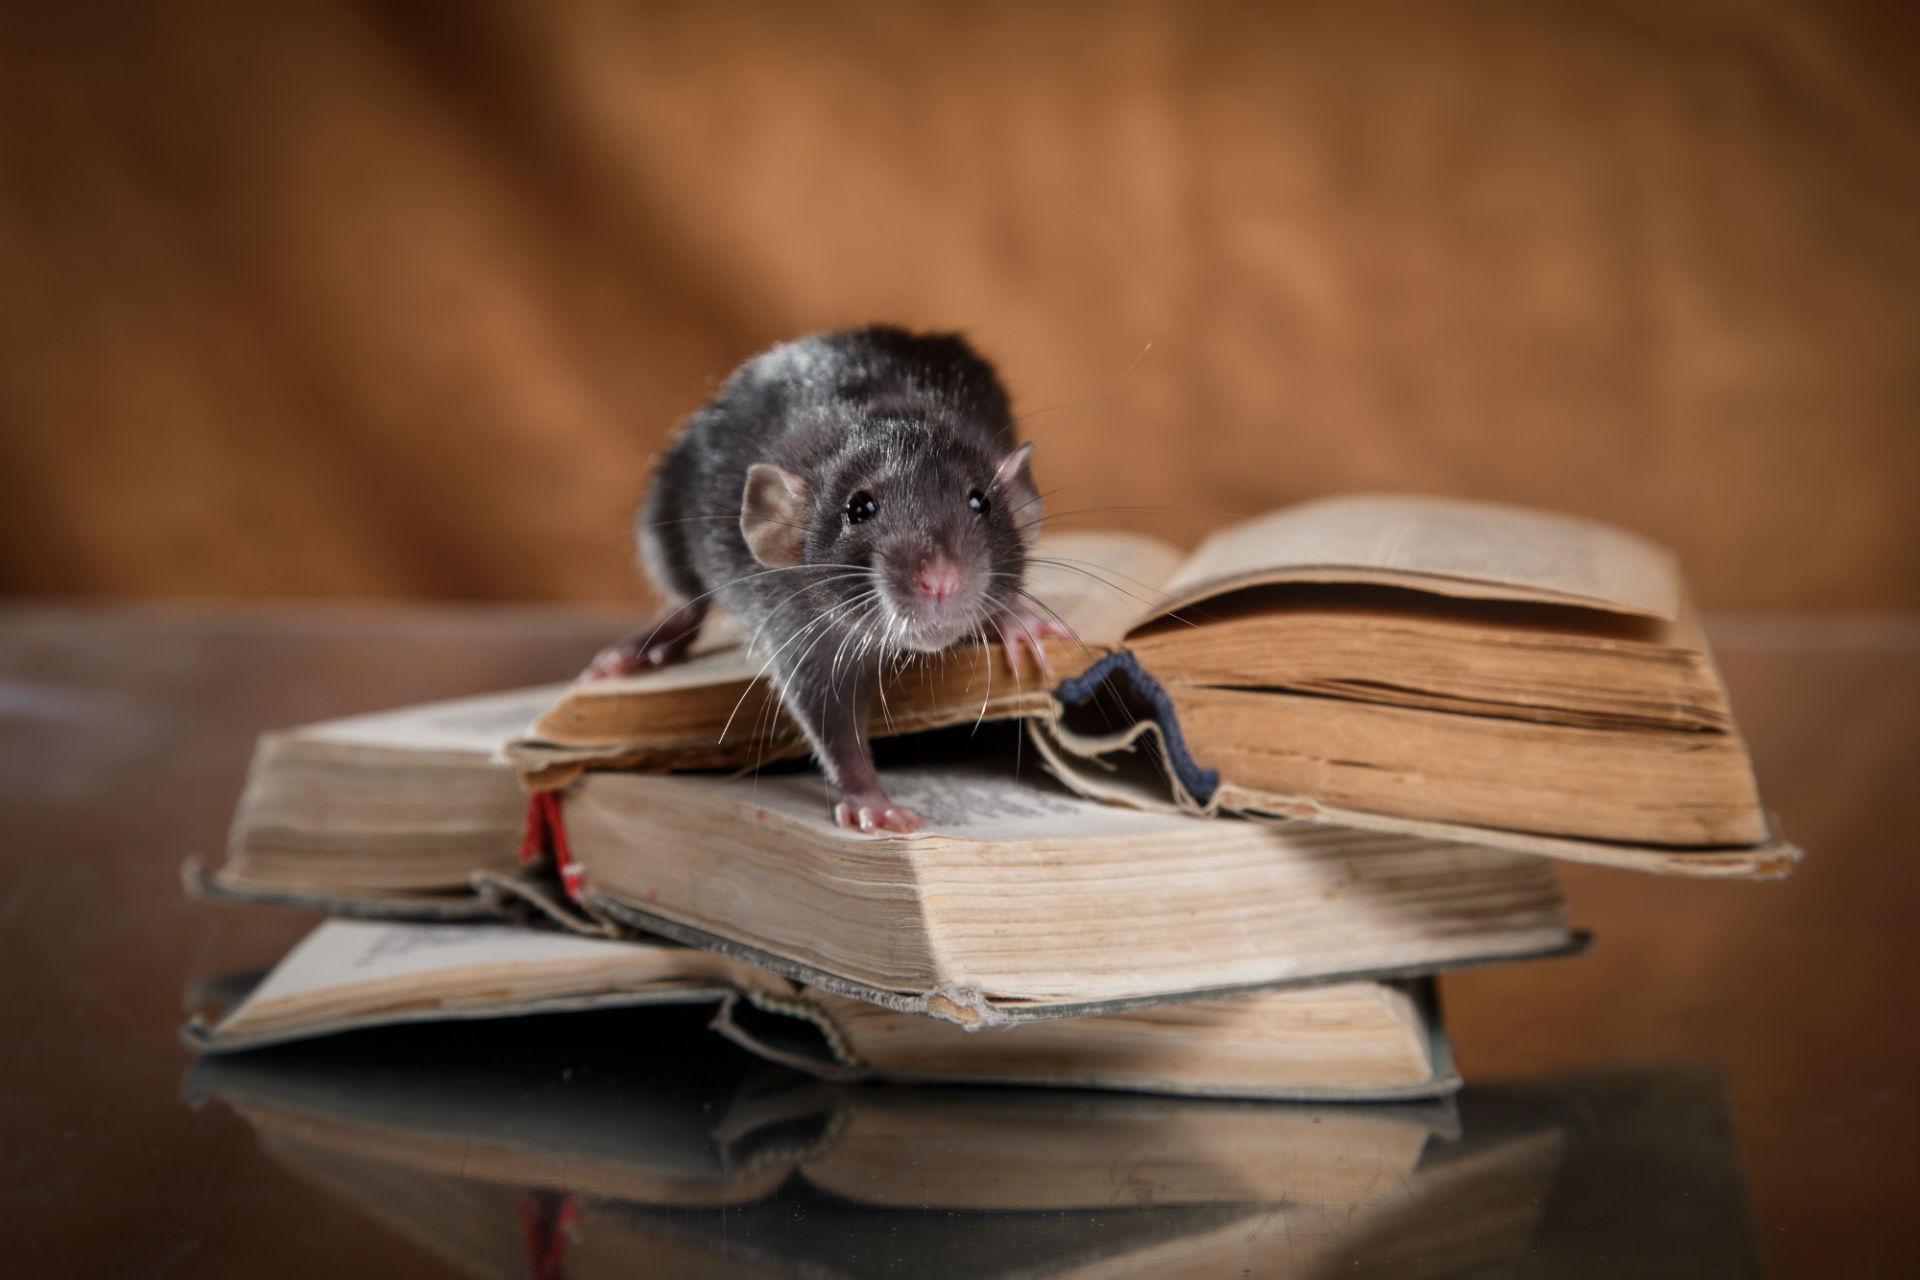 Extermination Souris Montreal | Extermination rats